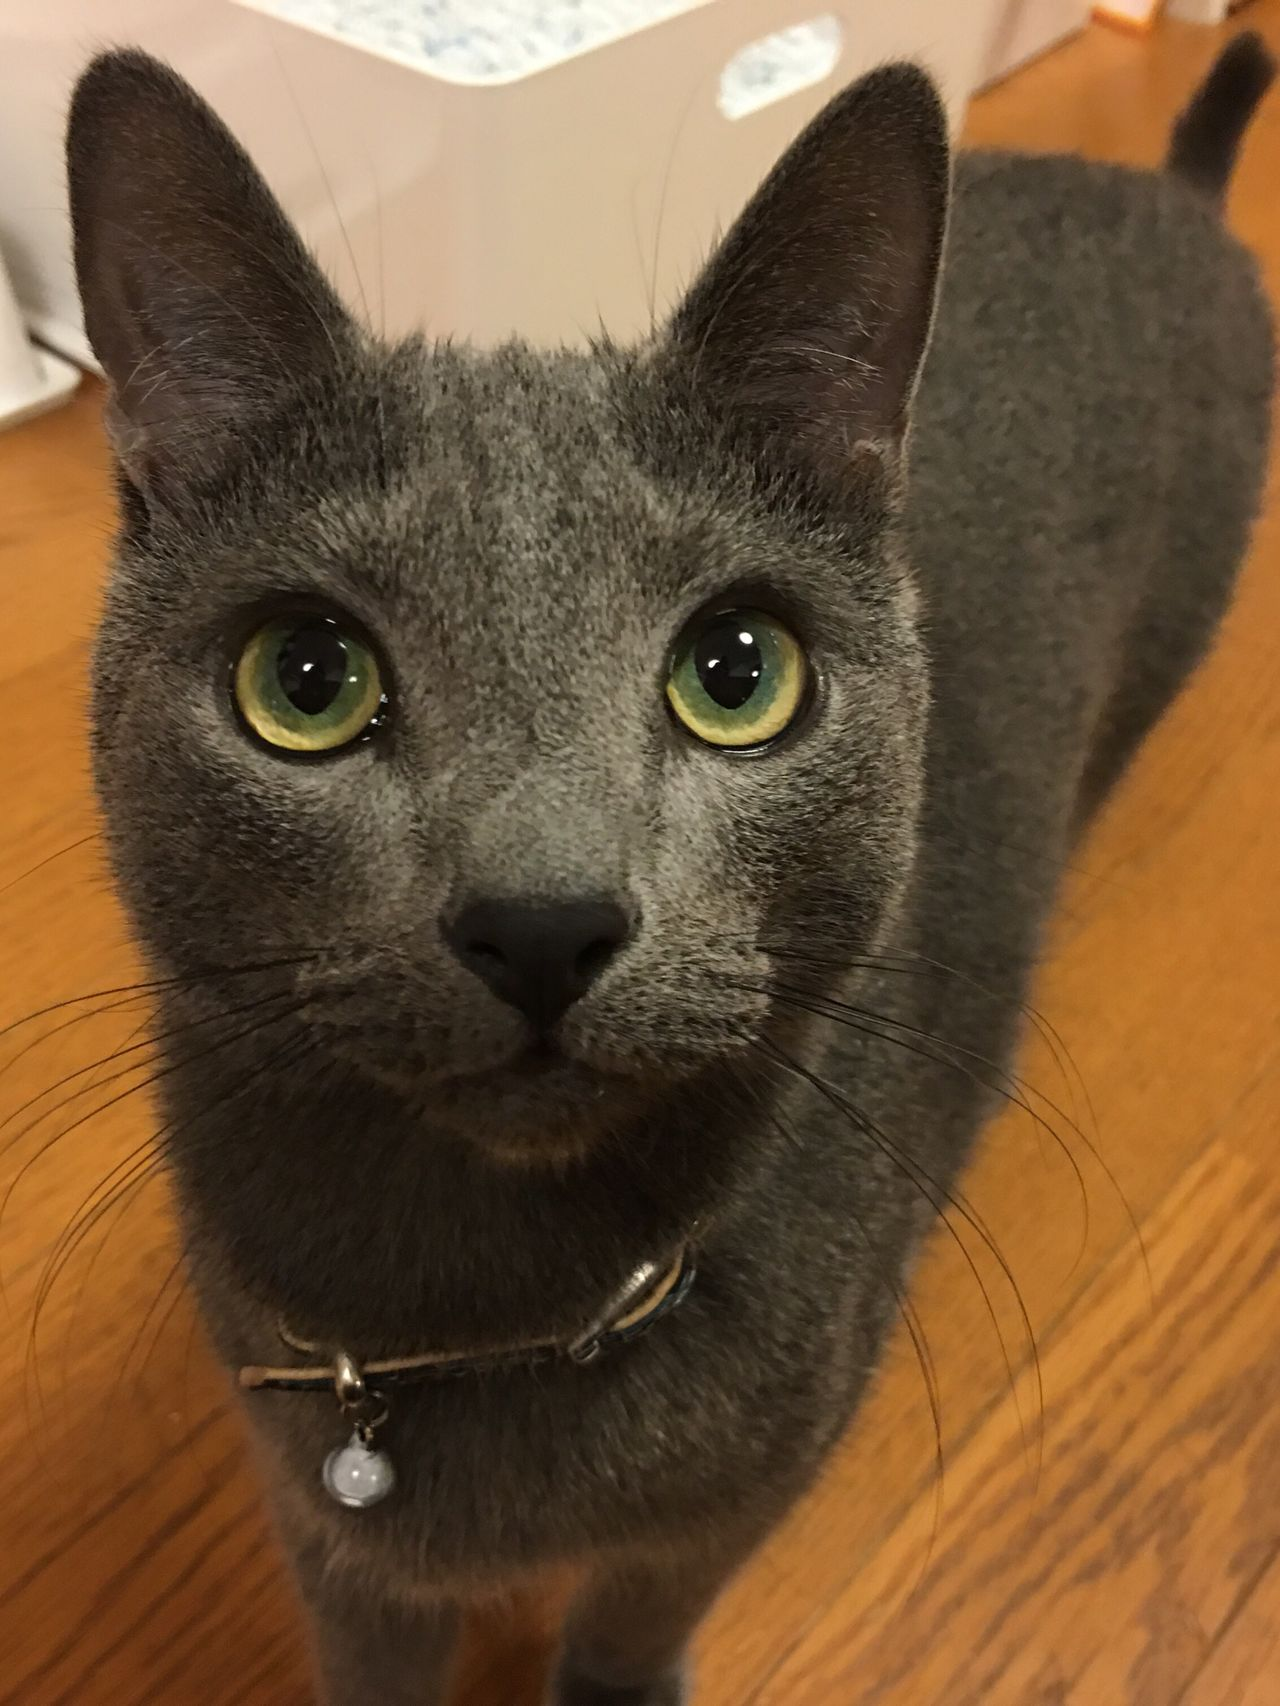 Mycat Lovely Cat RussianBlue Kitten